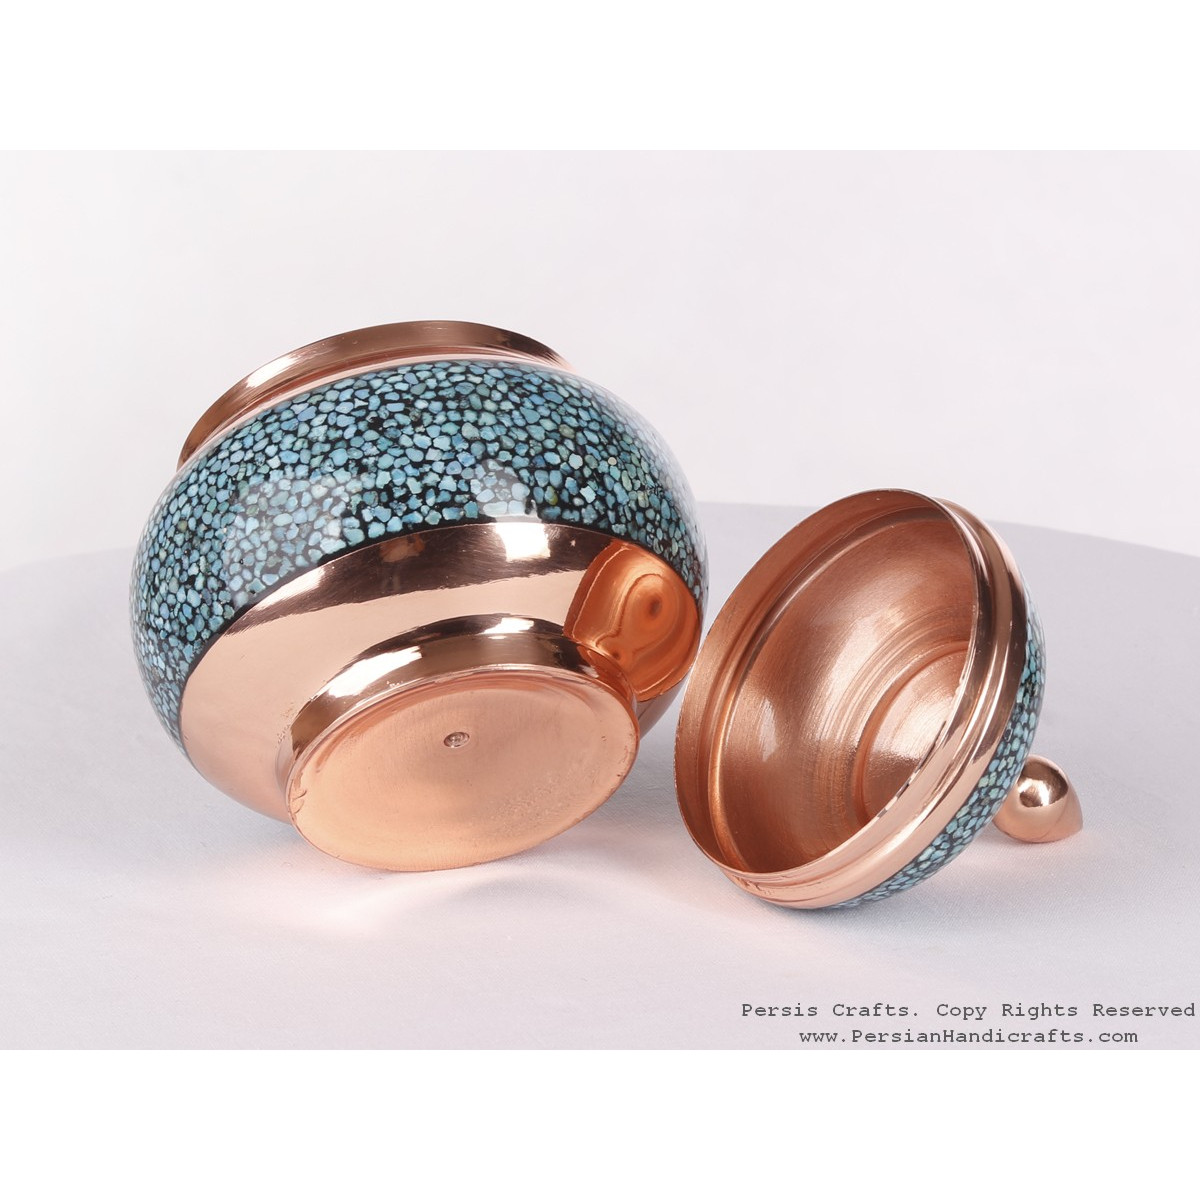 Turquoise Inlaying (FiroozehKoobi) Sugar/Candy Pot - HTI3001-Persian Handicrafts